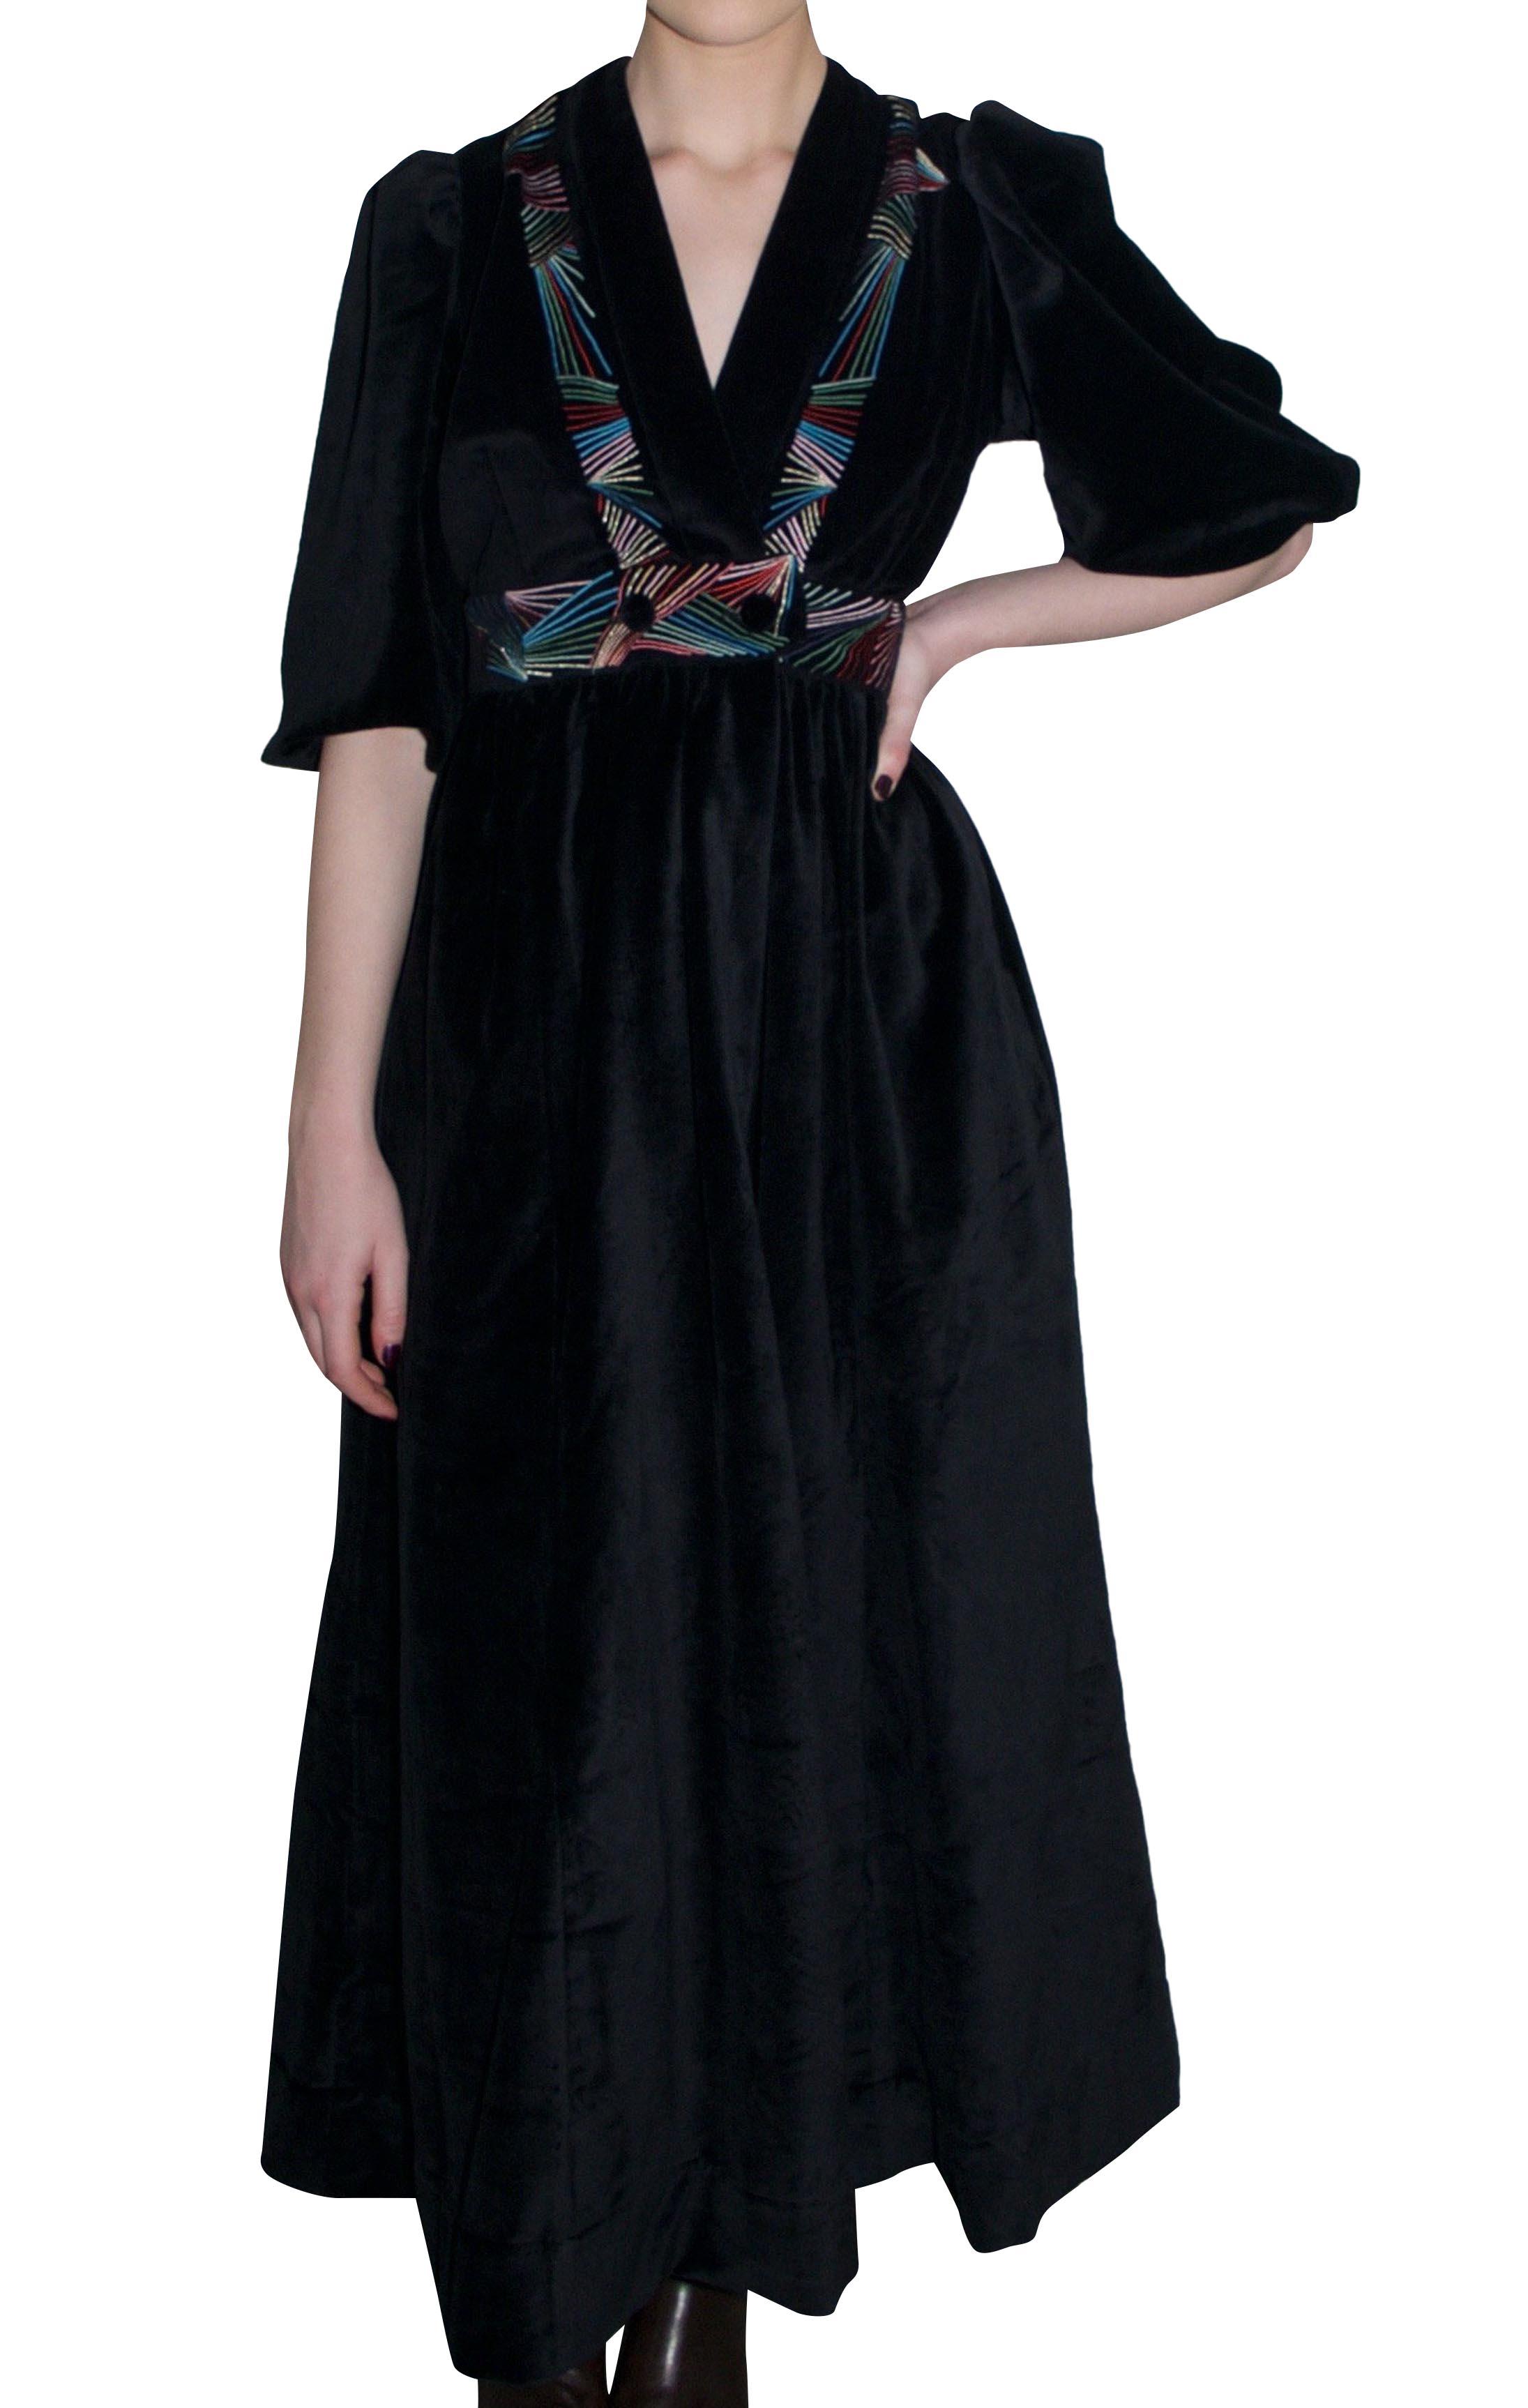 Lola dress black by Tallulah & Hope - 1